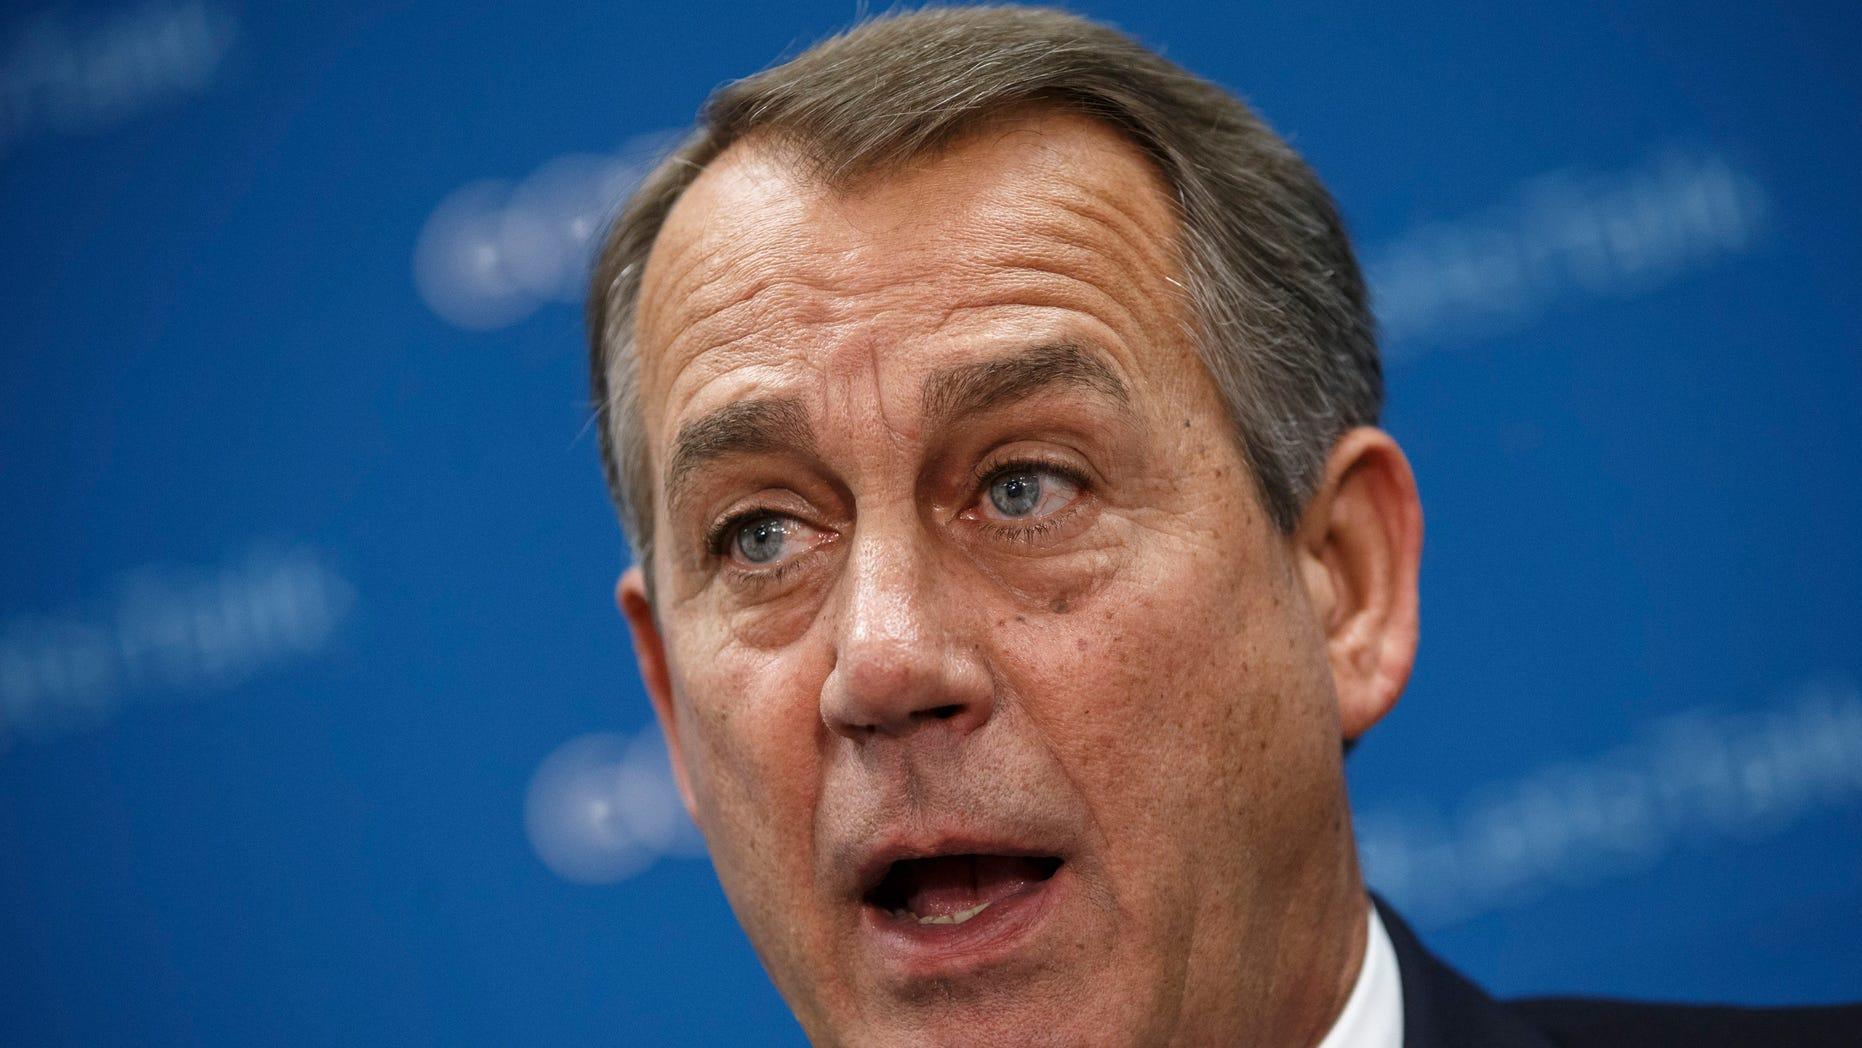 Oct. 8, 2013: House Speaker John Boehner speaks during a news conference on Capitol Hill in Washington.